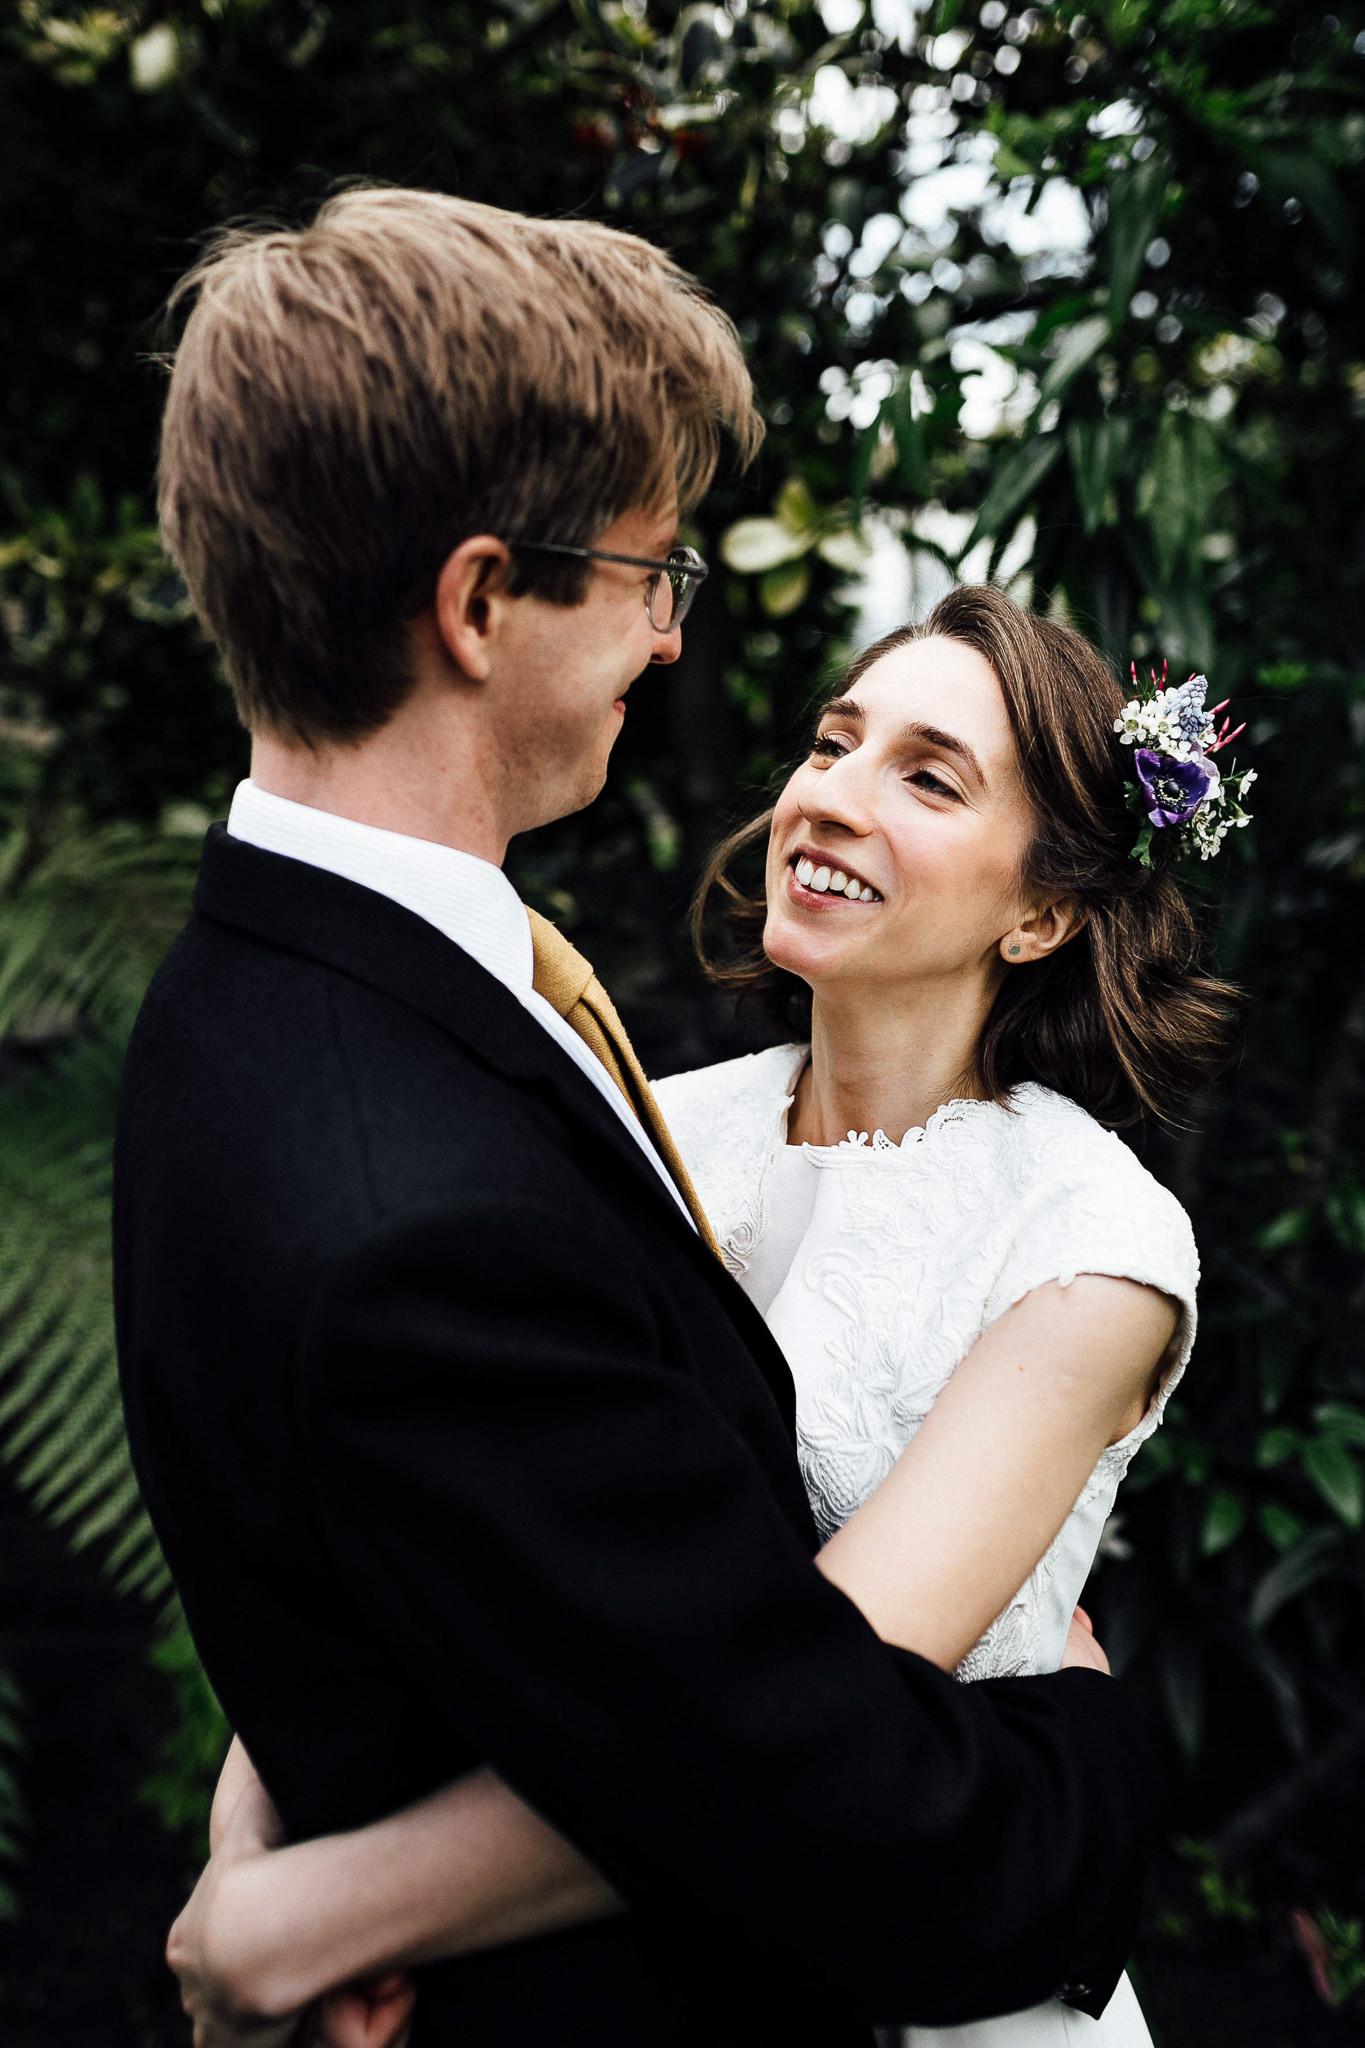 informal, fun, quirky brighton wedding